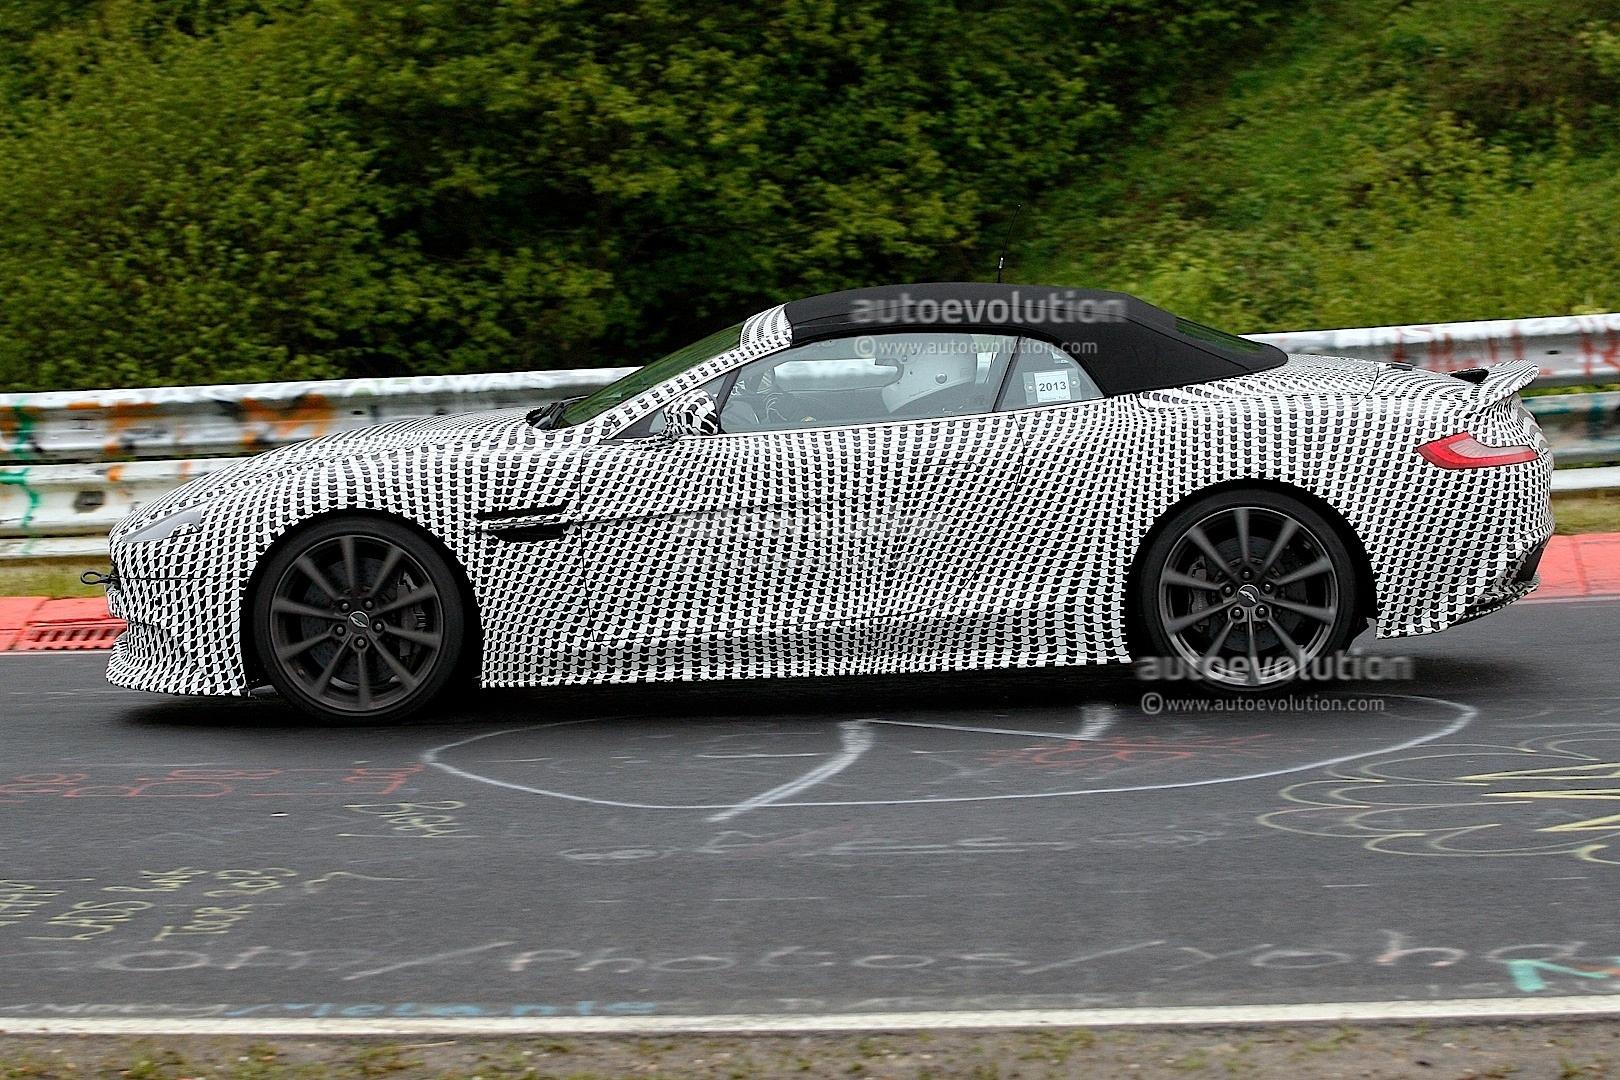 2014 Aston Martin Vanquish Volante Spied The Inevitable Droptop | Apps ...